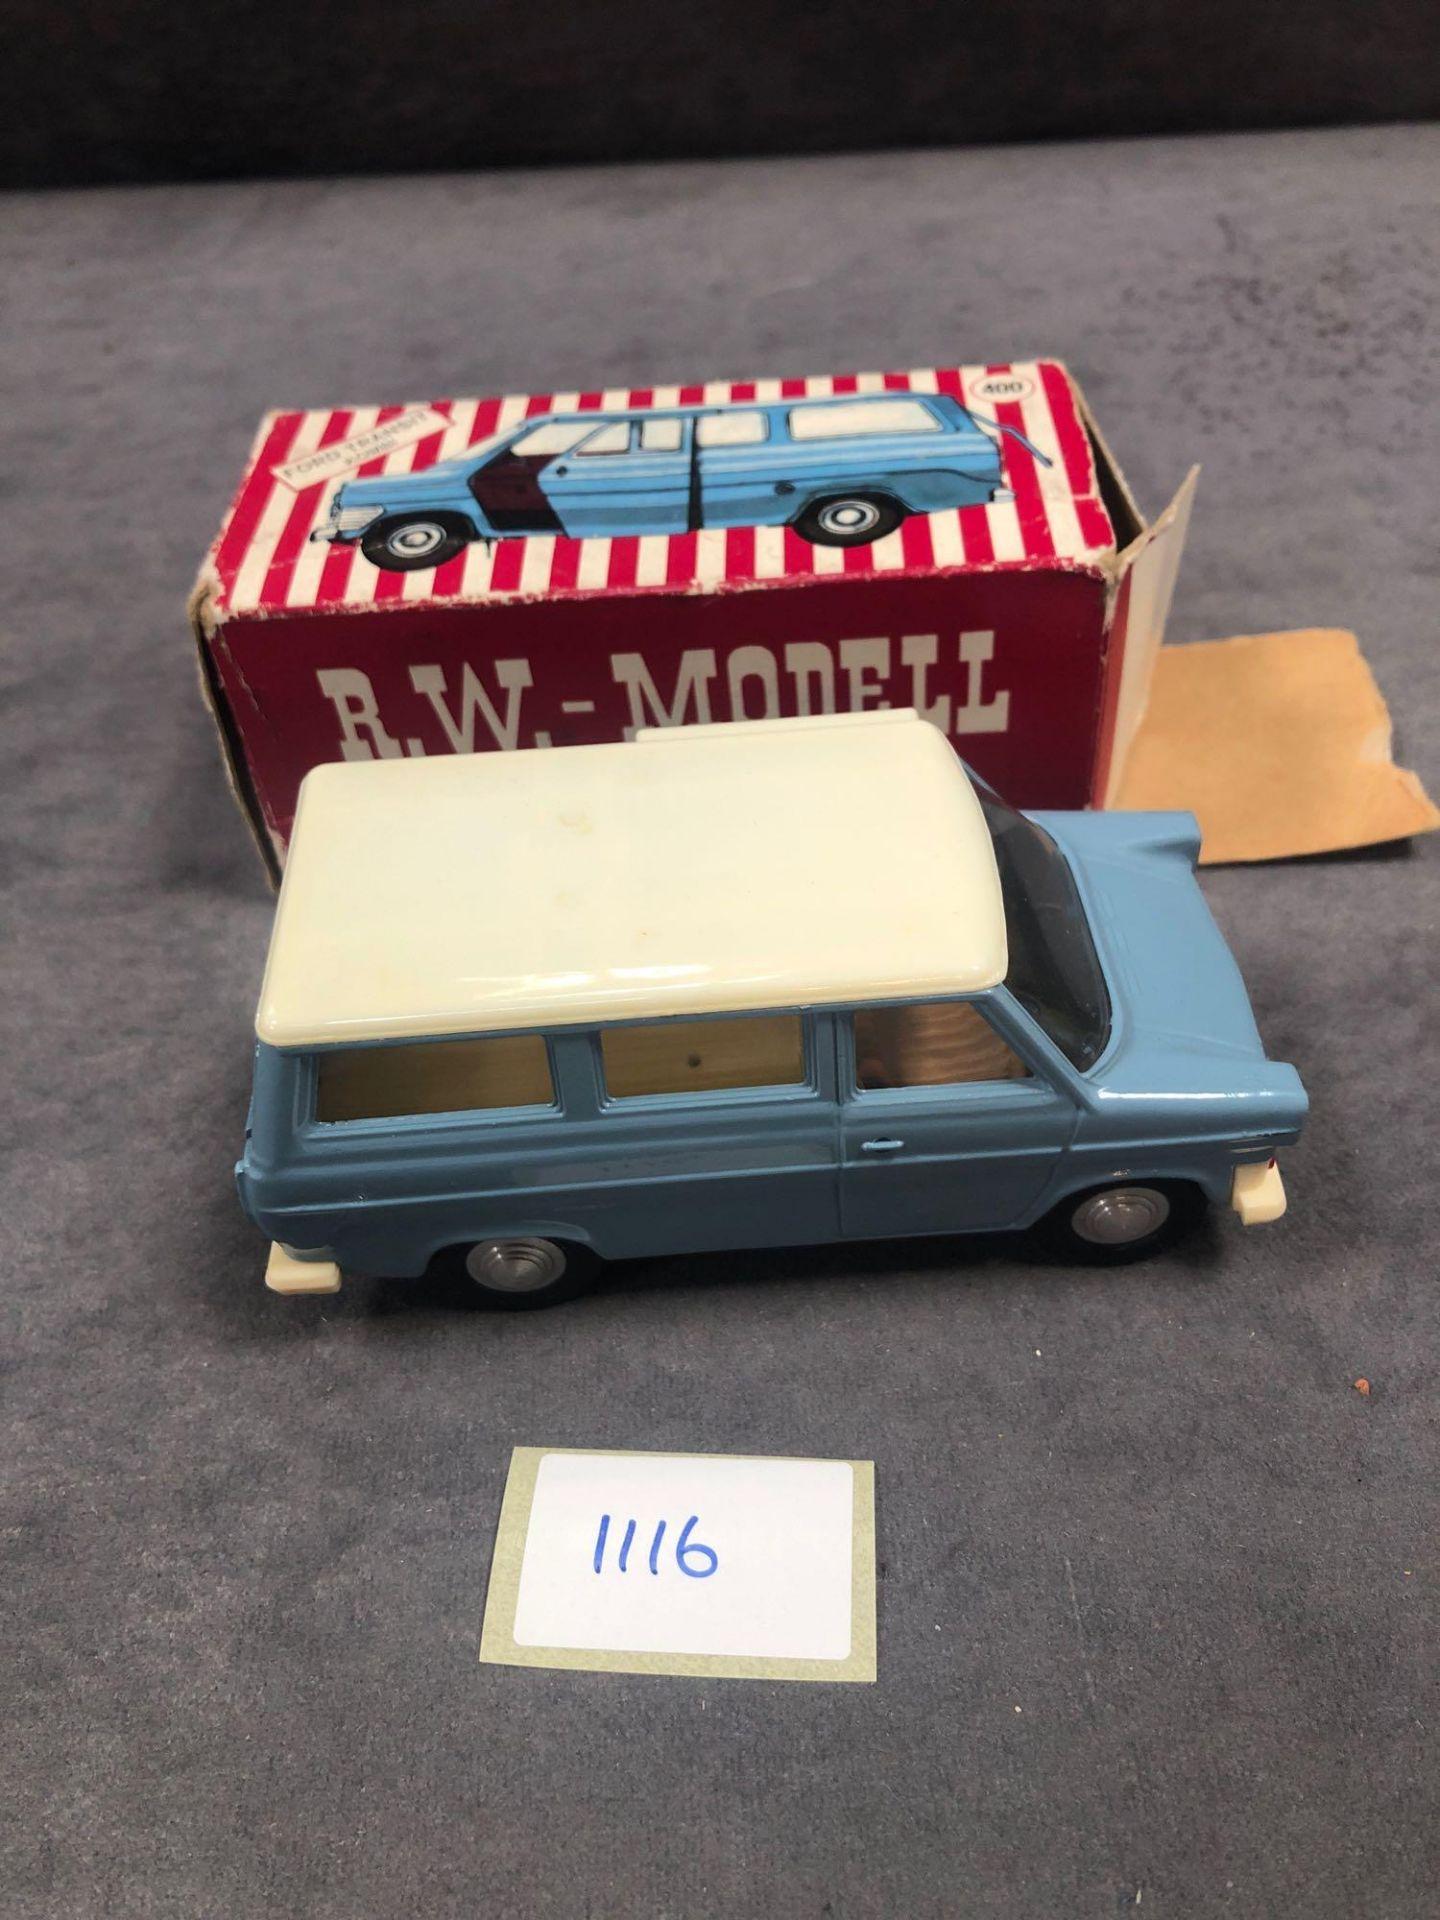 R.W.-Modell (Germany) #400 Ford Transit Kombi In Box